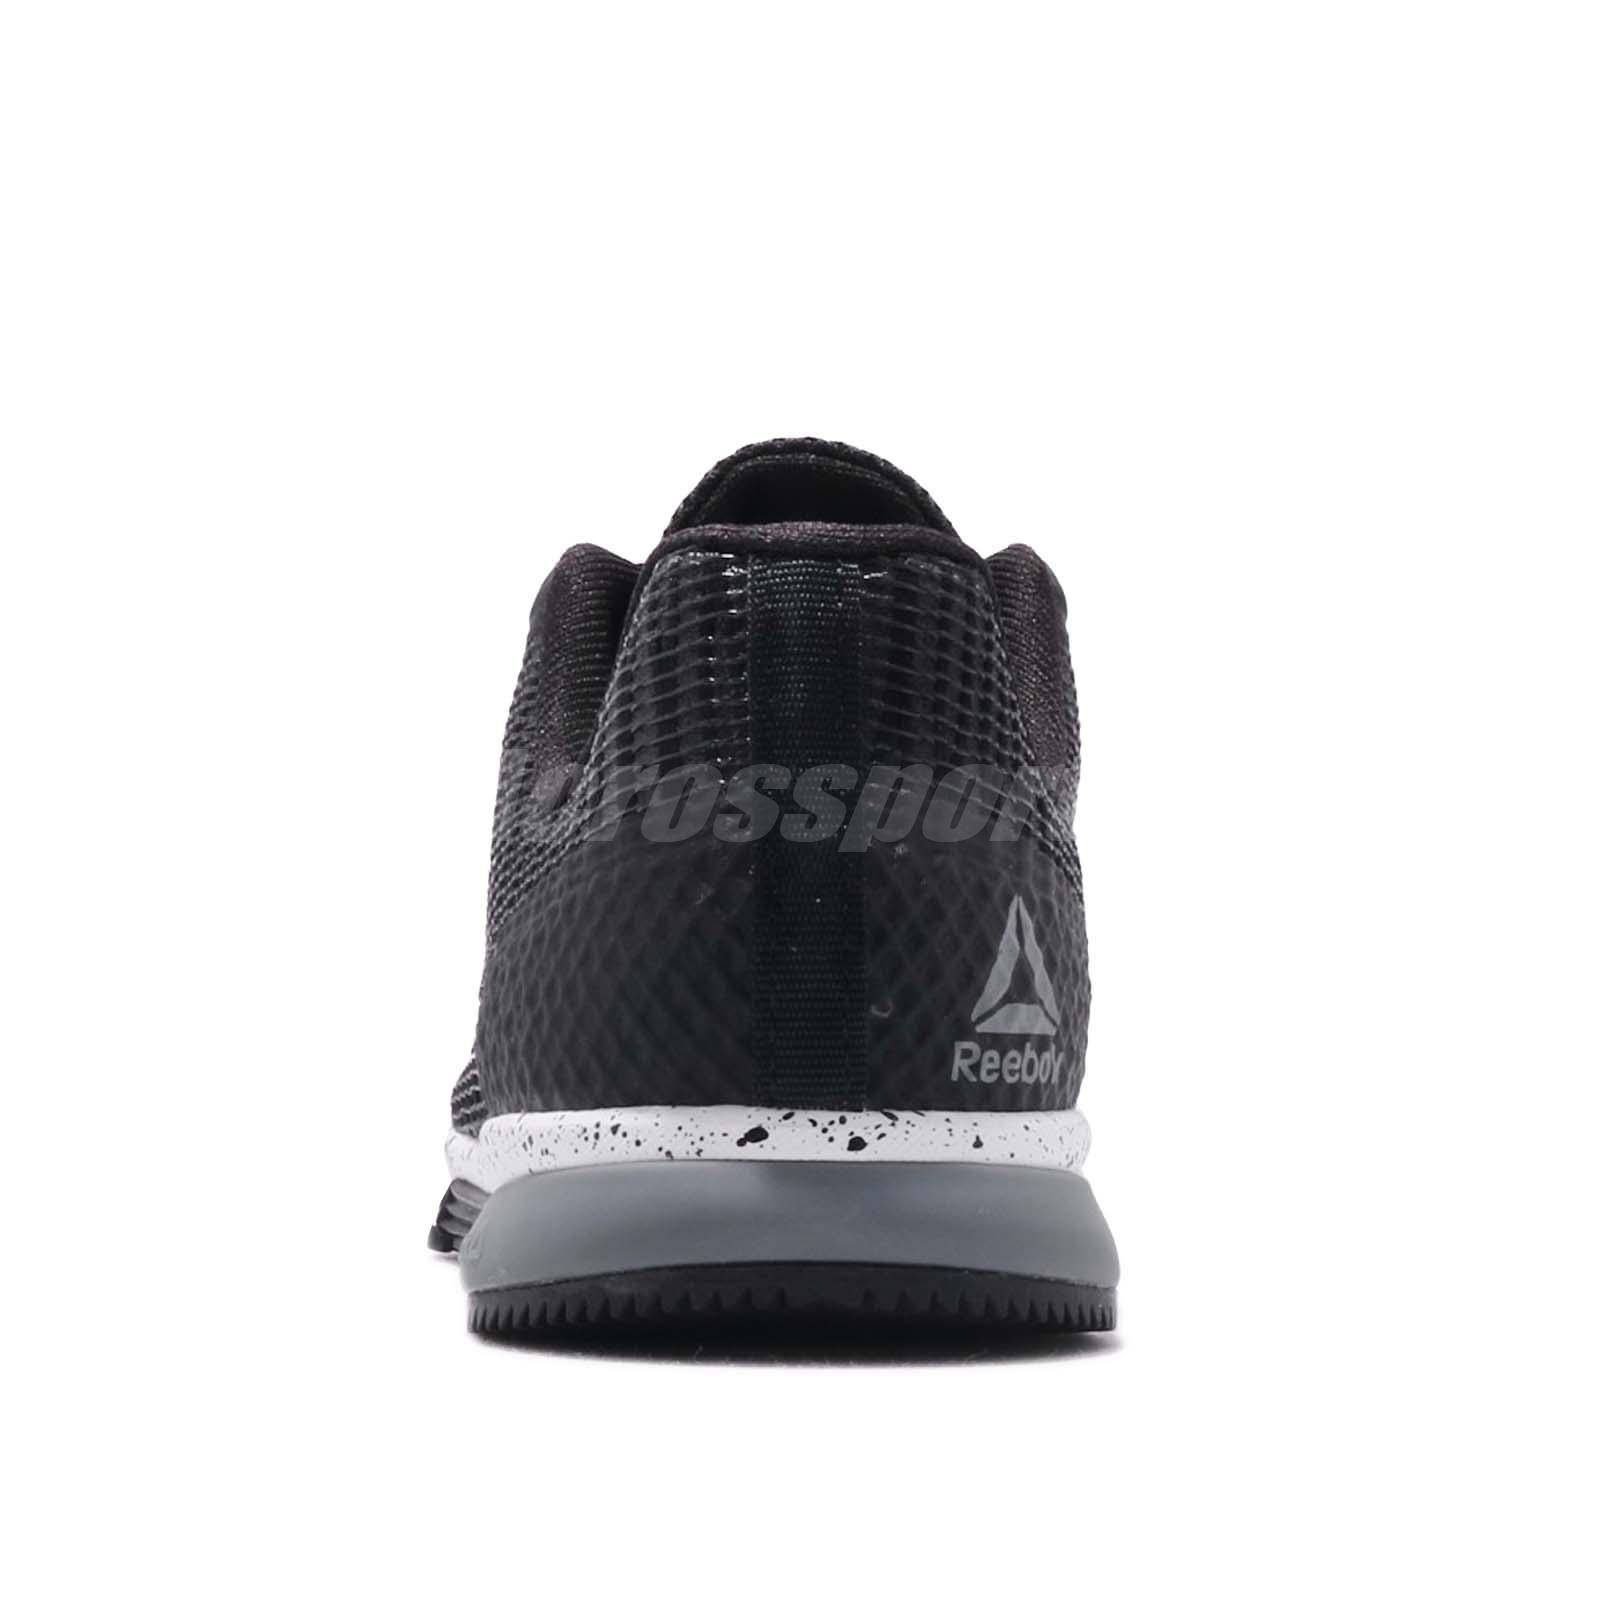 acddaab3c1b Reebok Speed TR Flexweave Black Grey Womens Cross Training Shoes ...